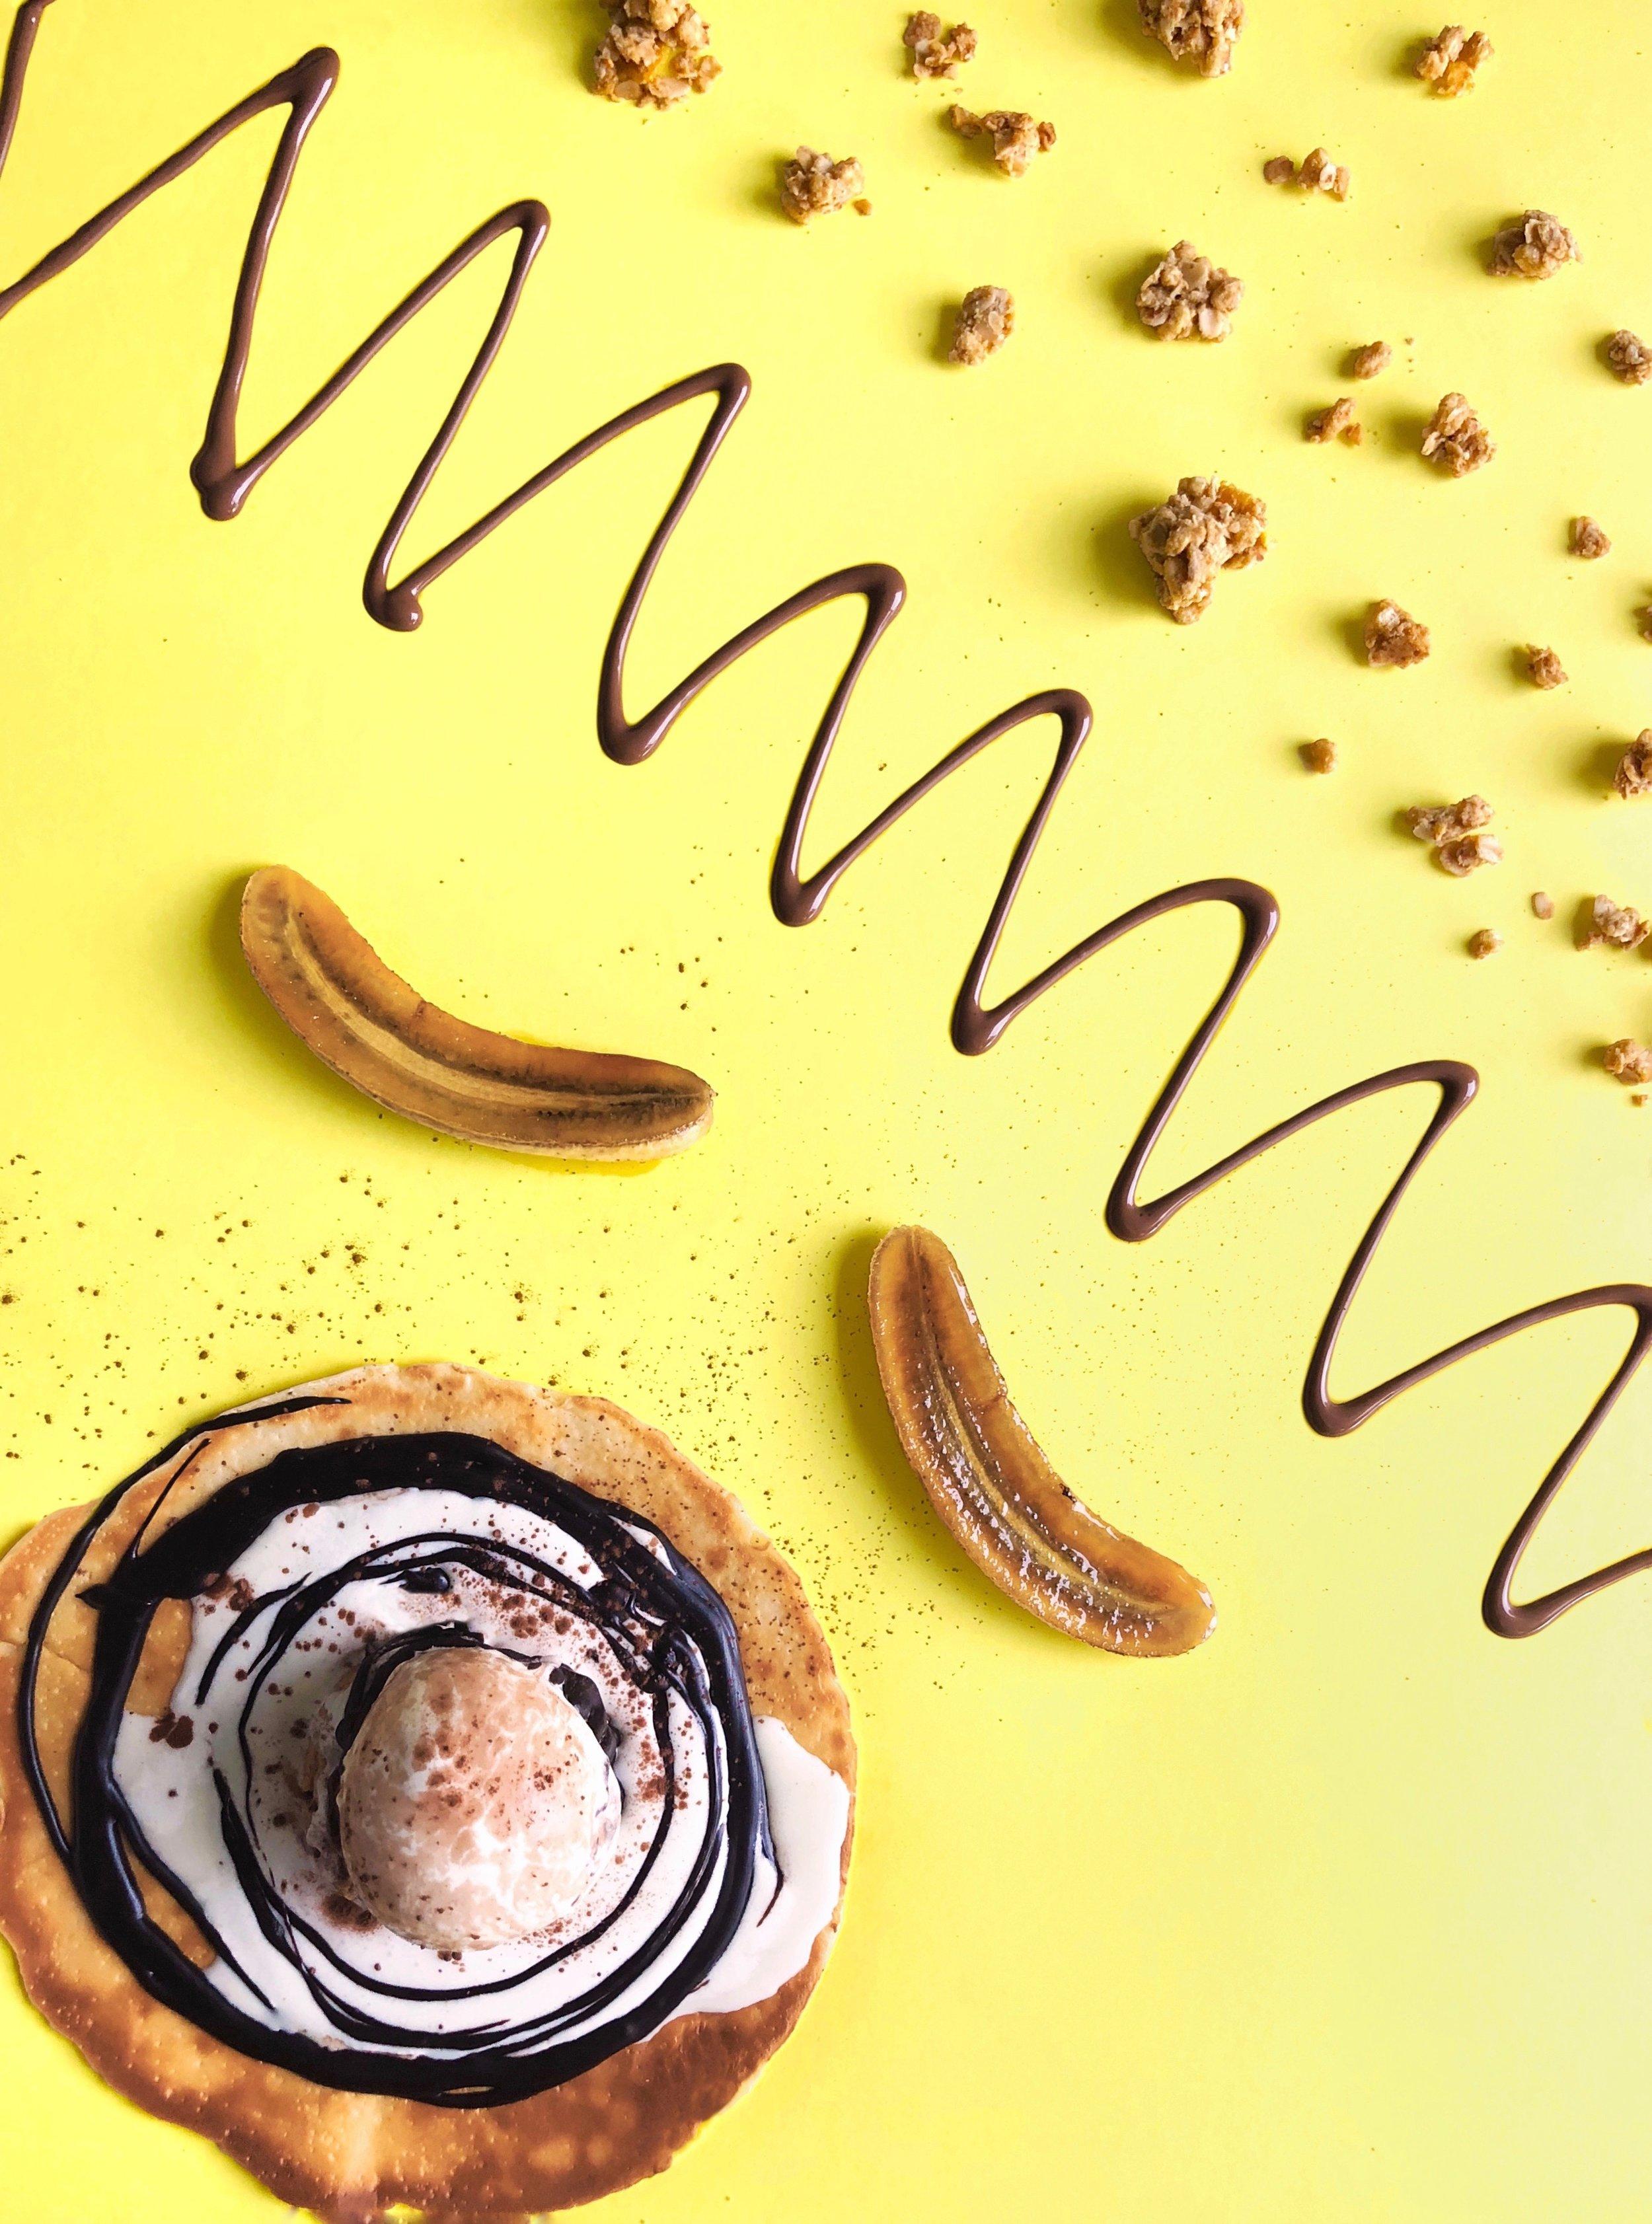 Nutella Banana Crepe from Shakespeare Milkshakes